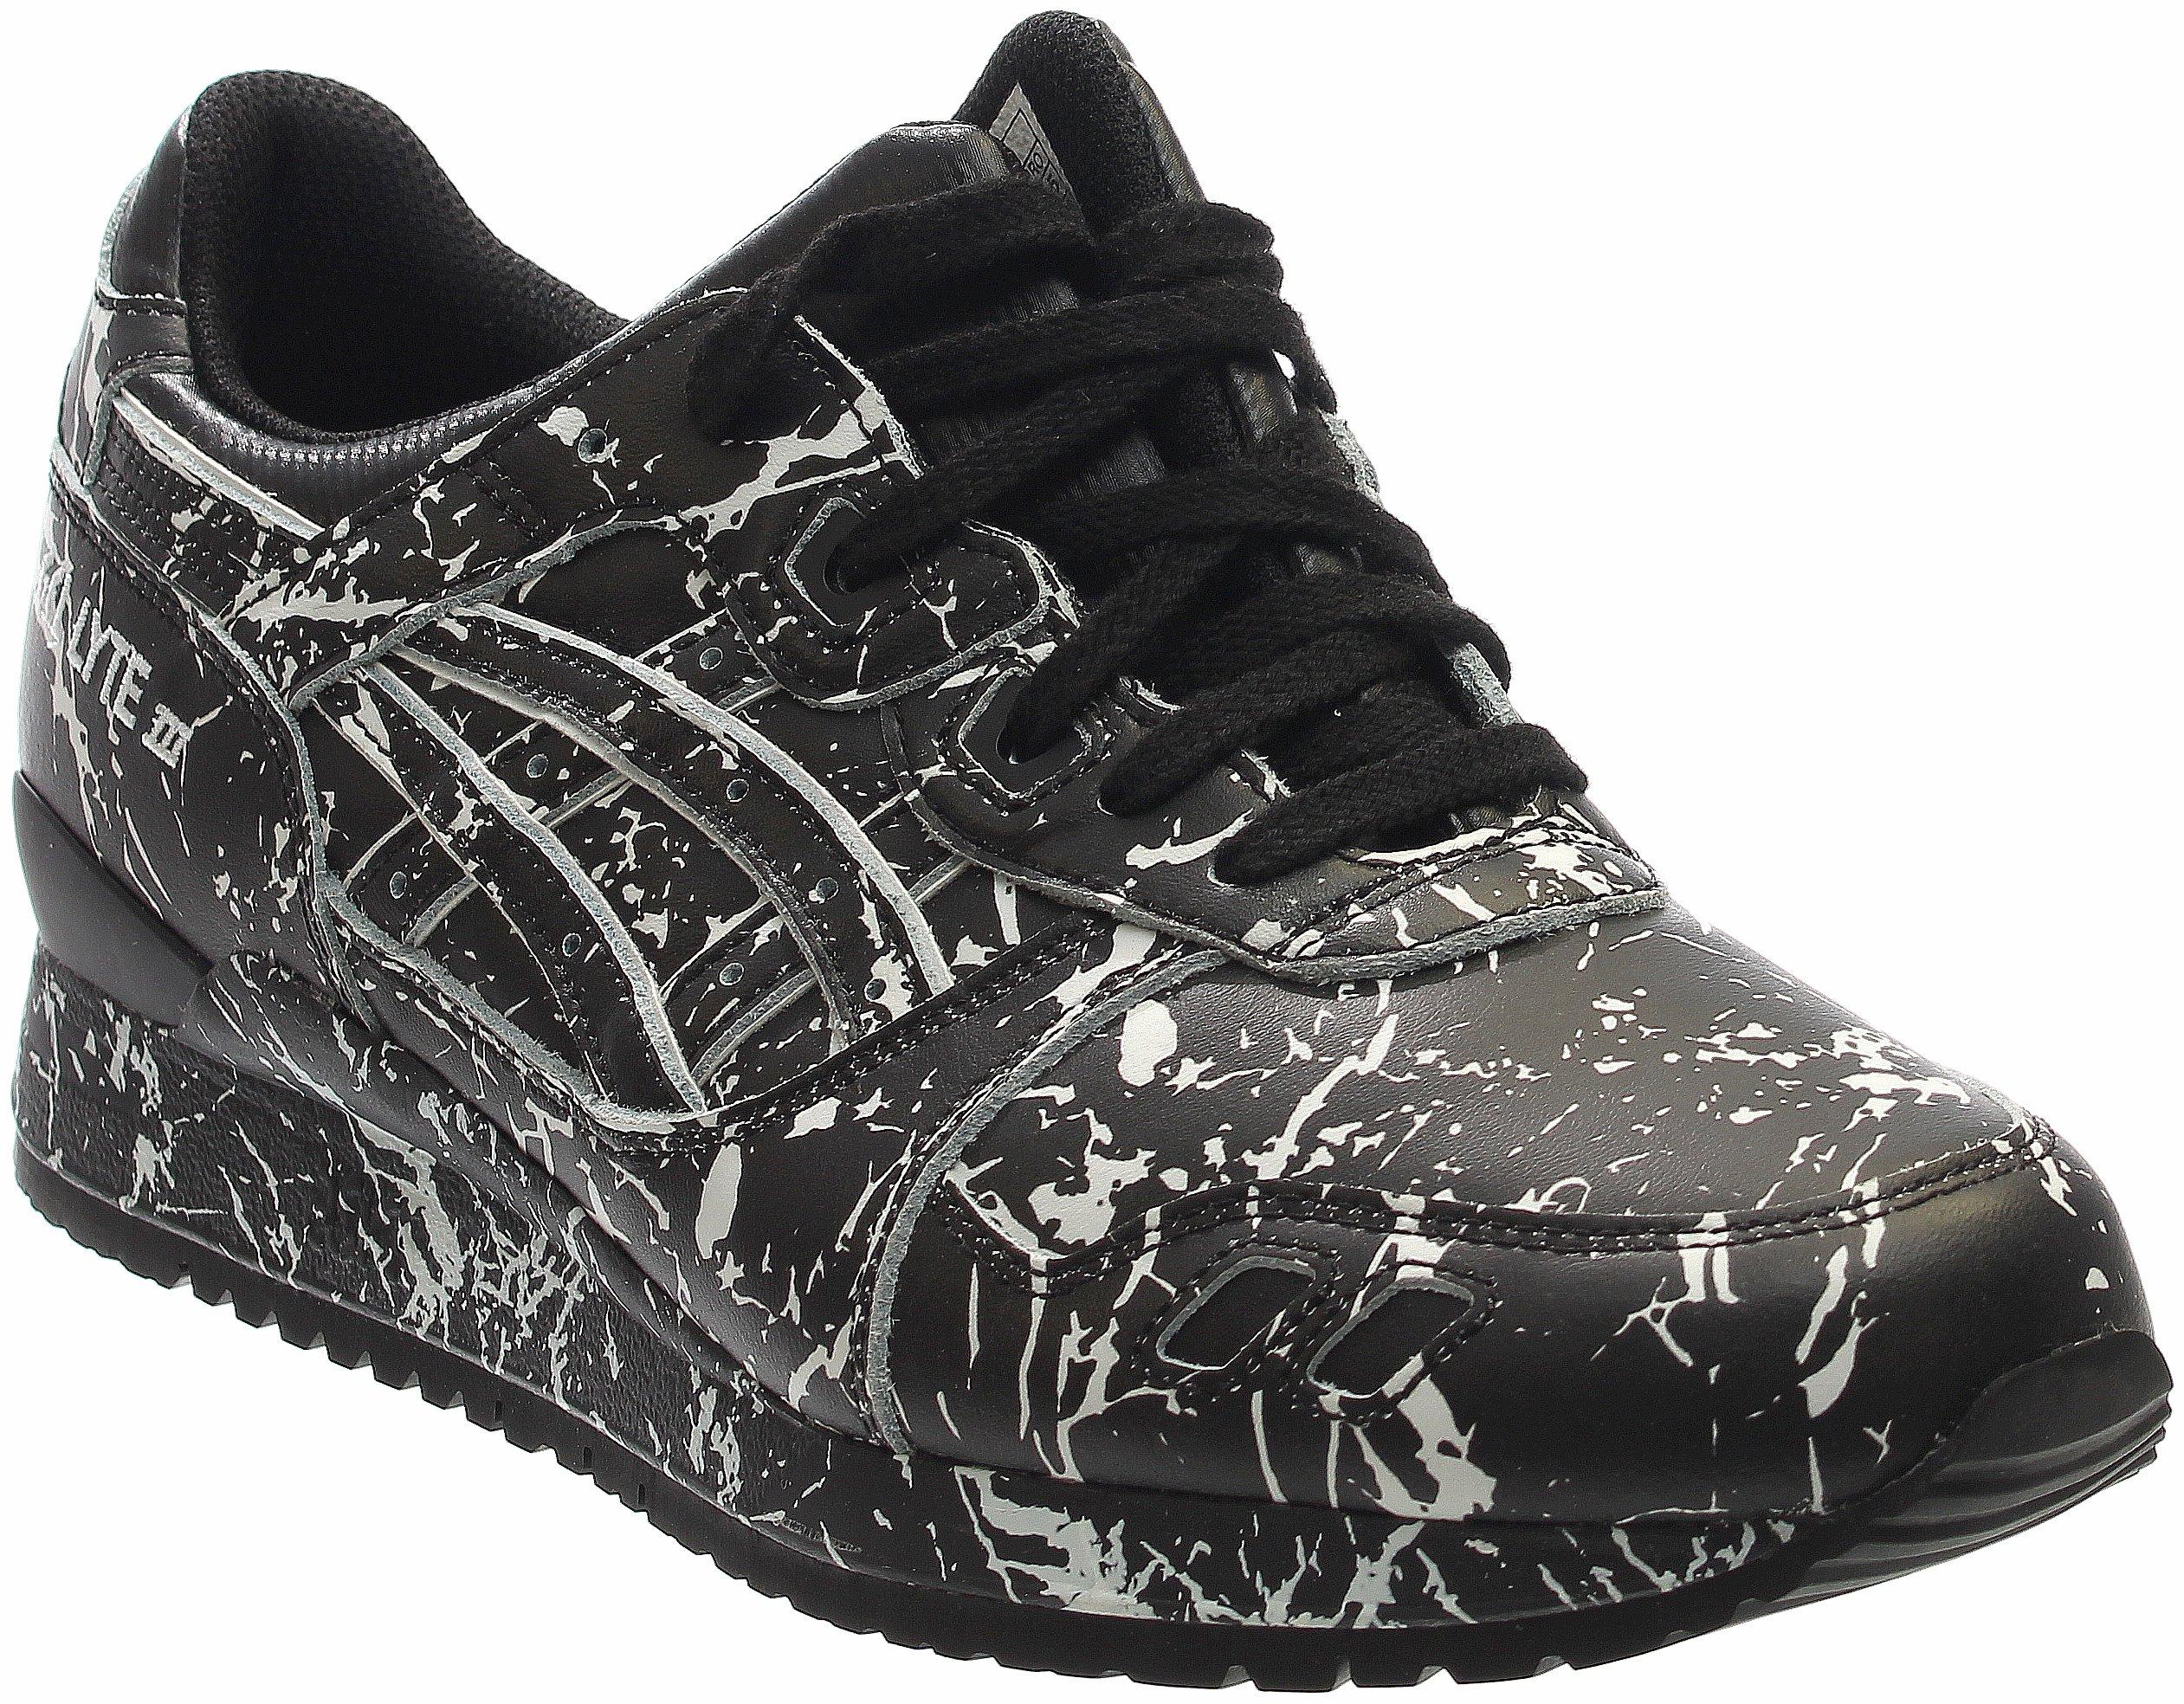 814dc36a0ed5f ASICS Men's Gel-Lyte Iii Black/Ankle-High Leather Running Shoe - 6M